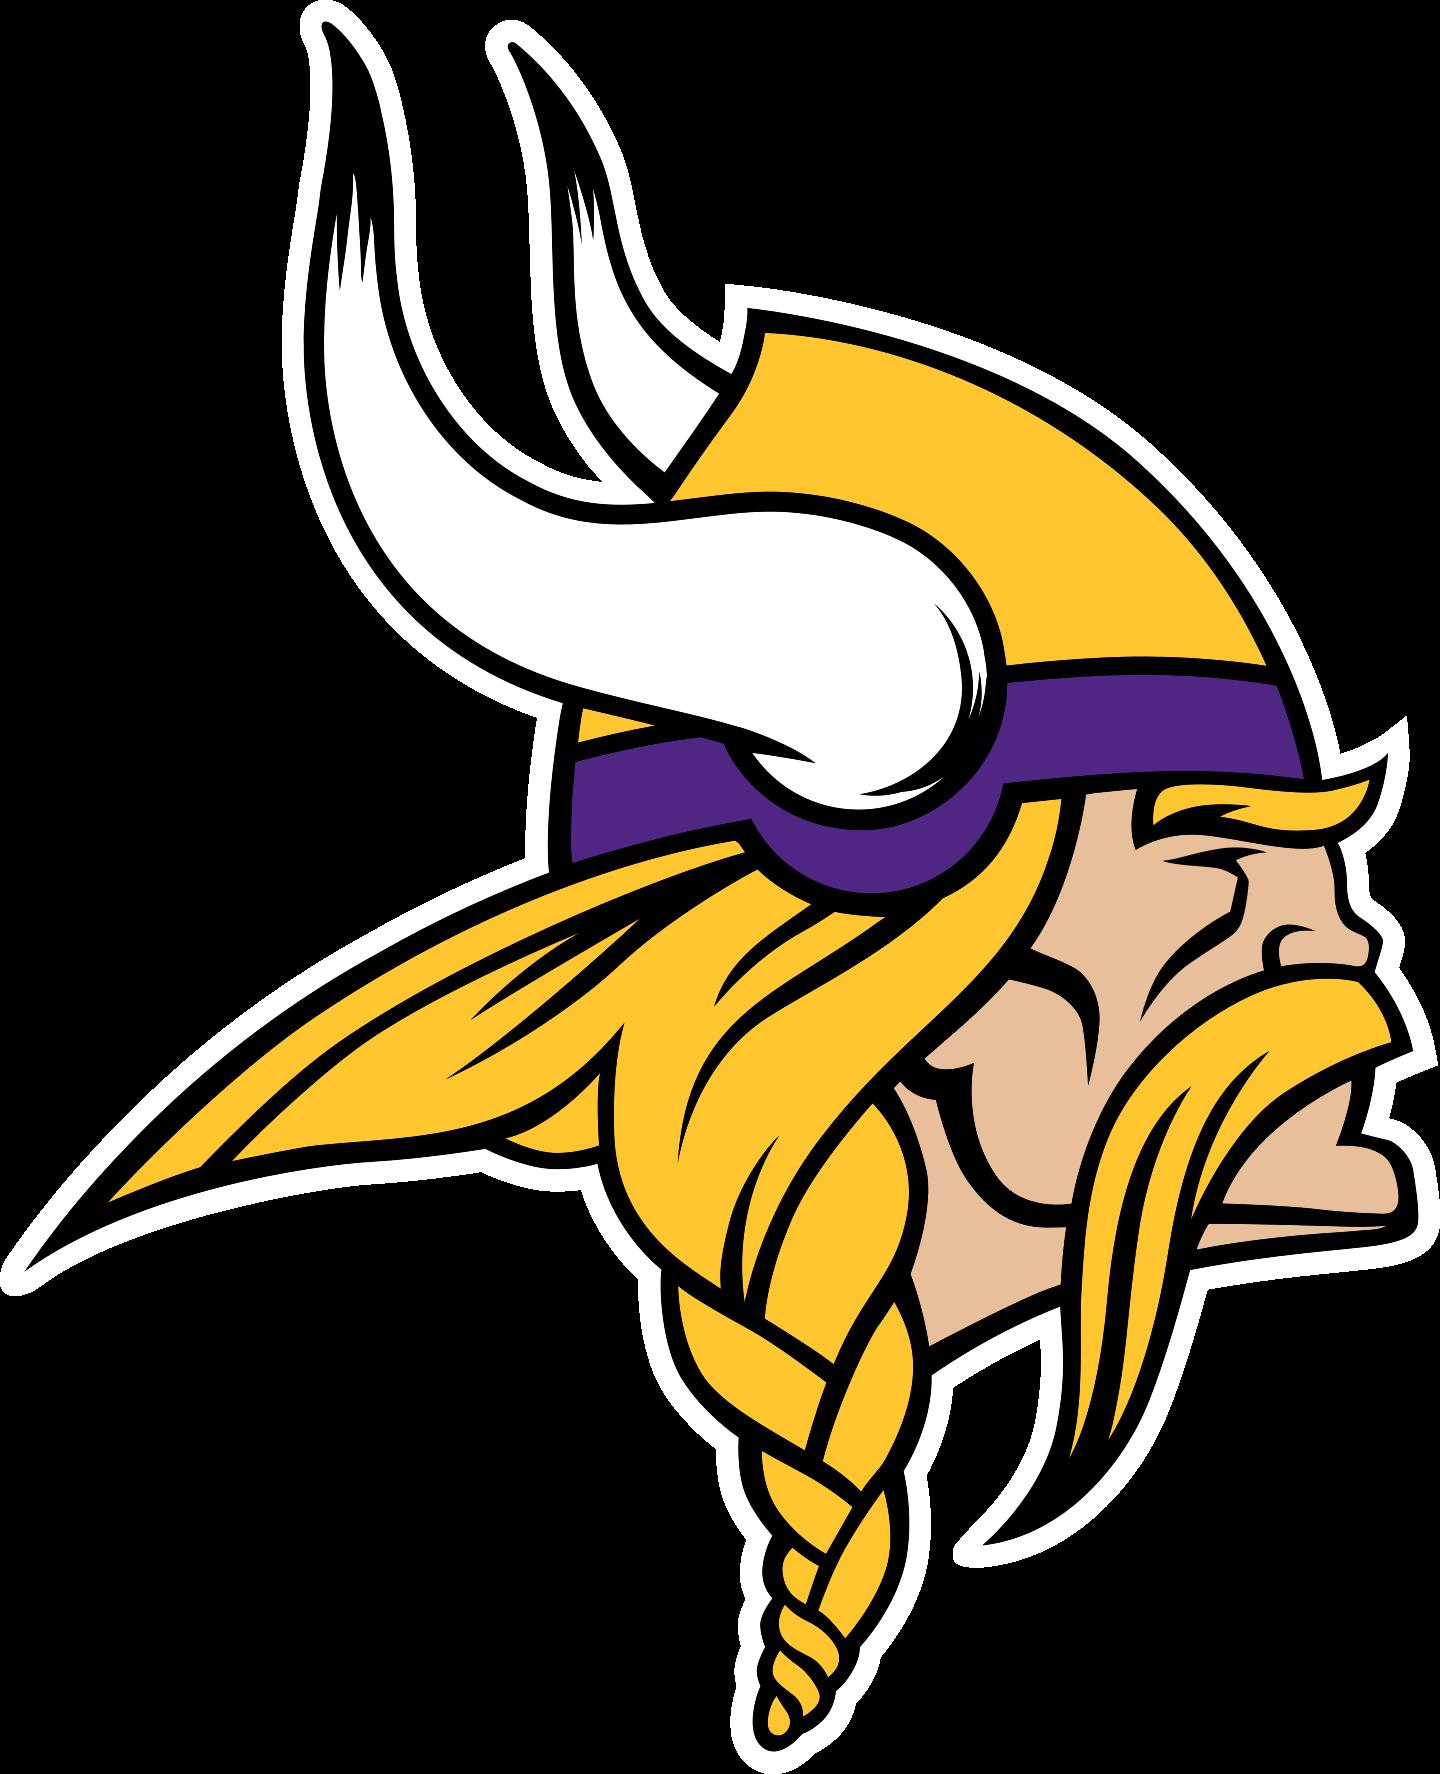 minnesota vikings logo 2 - Minnesota Vikings Logo